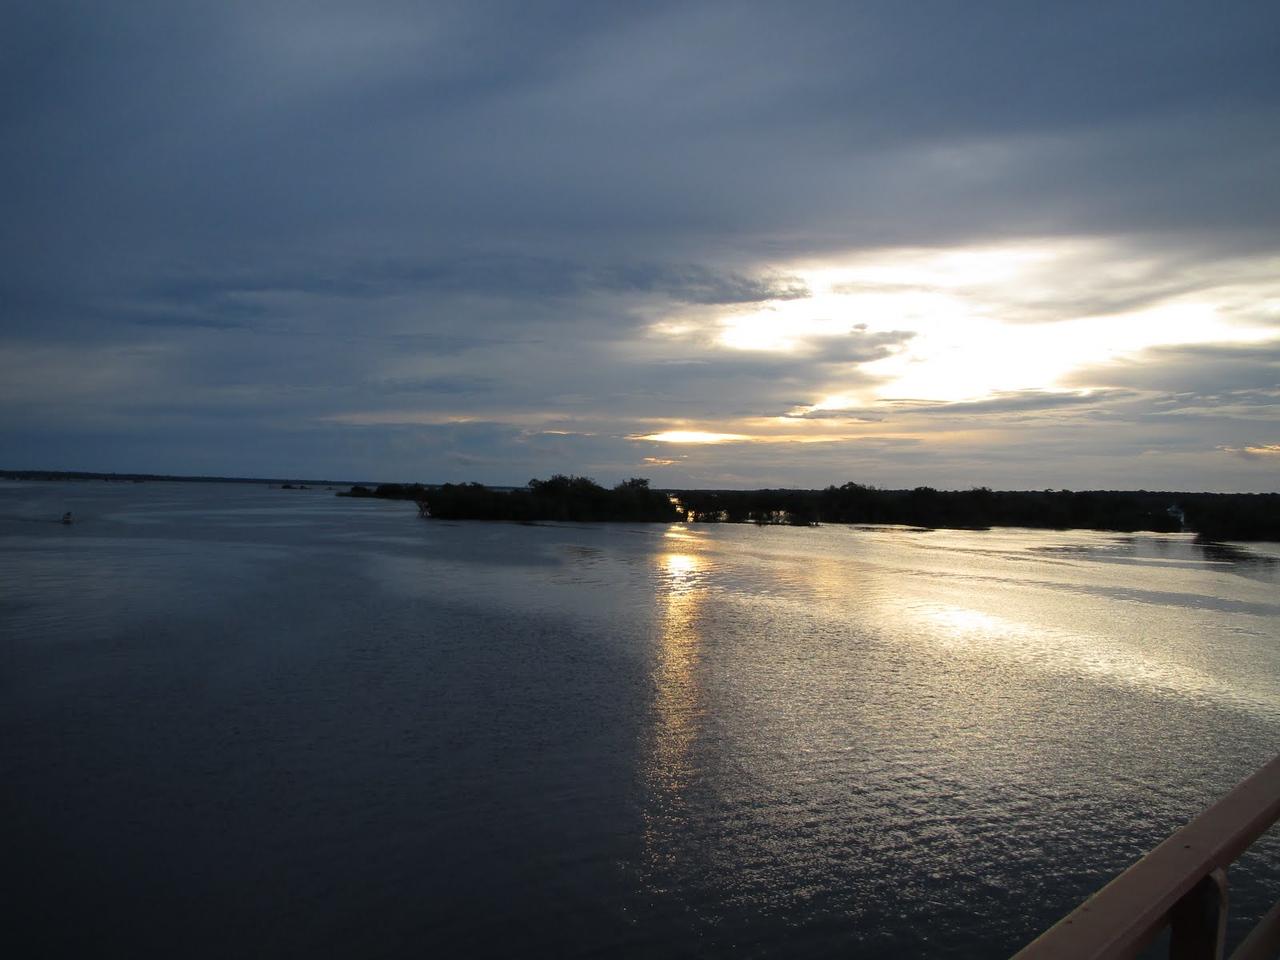 A pretty sunset on the Rio Negro